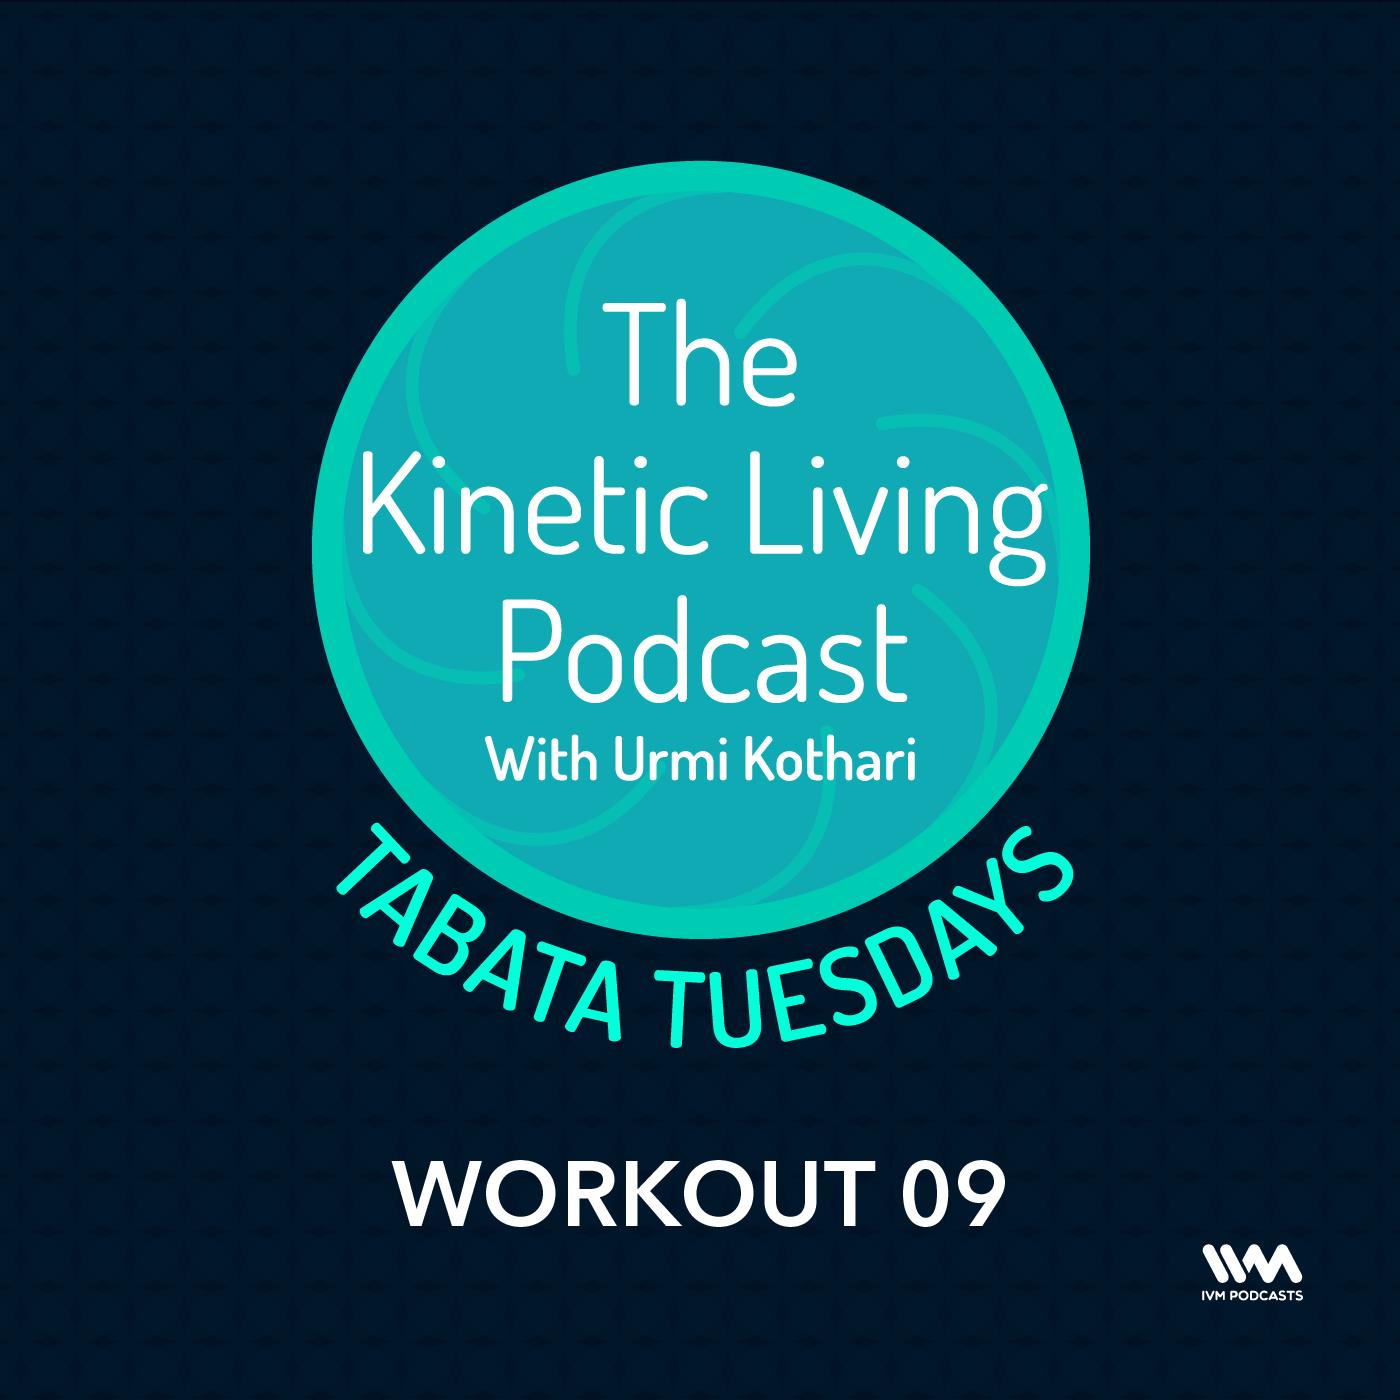 S02 E09: Tabata Tuesday - Workout 09